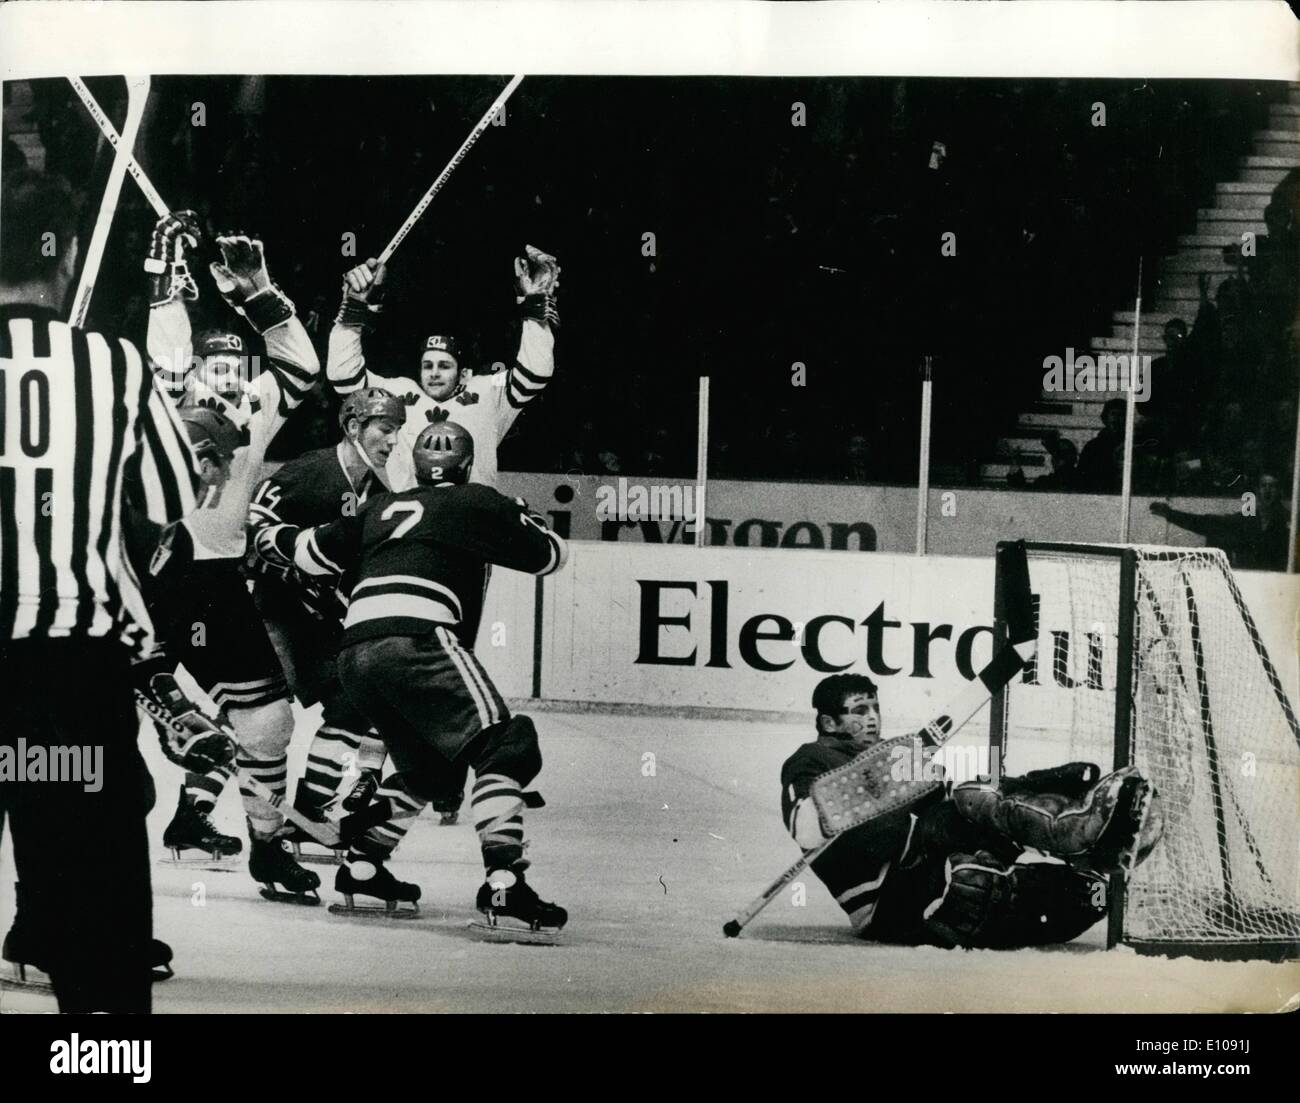 1970 Ice Hockey World Championships In High Resolution Stock ...